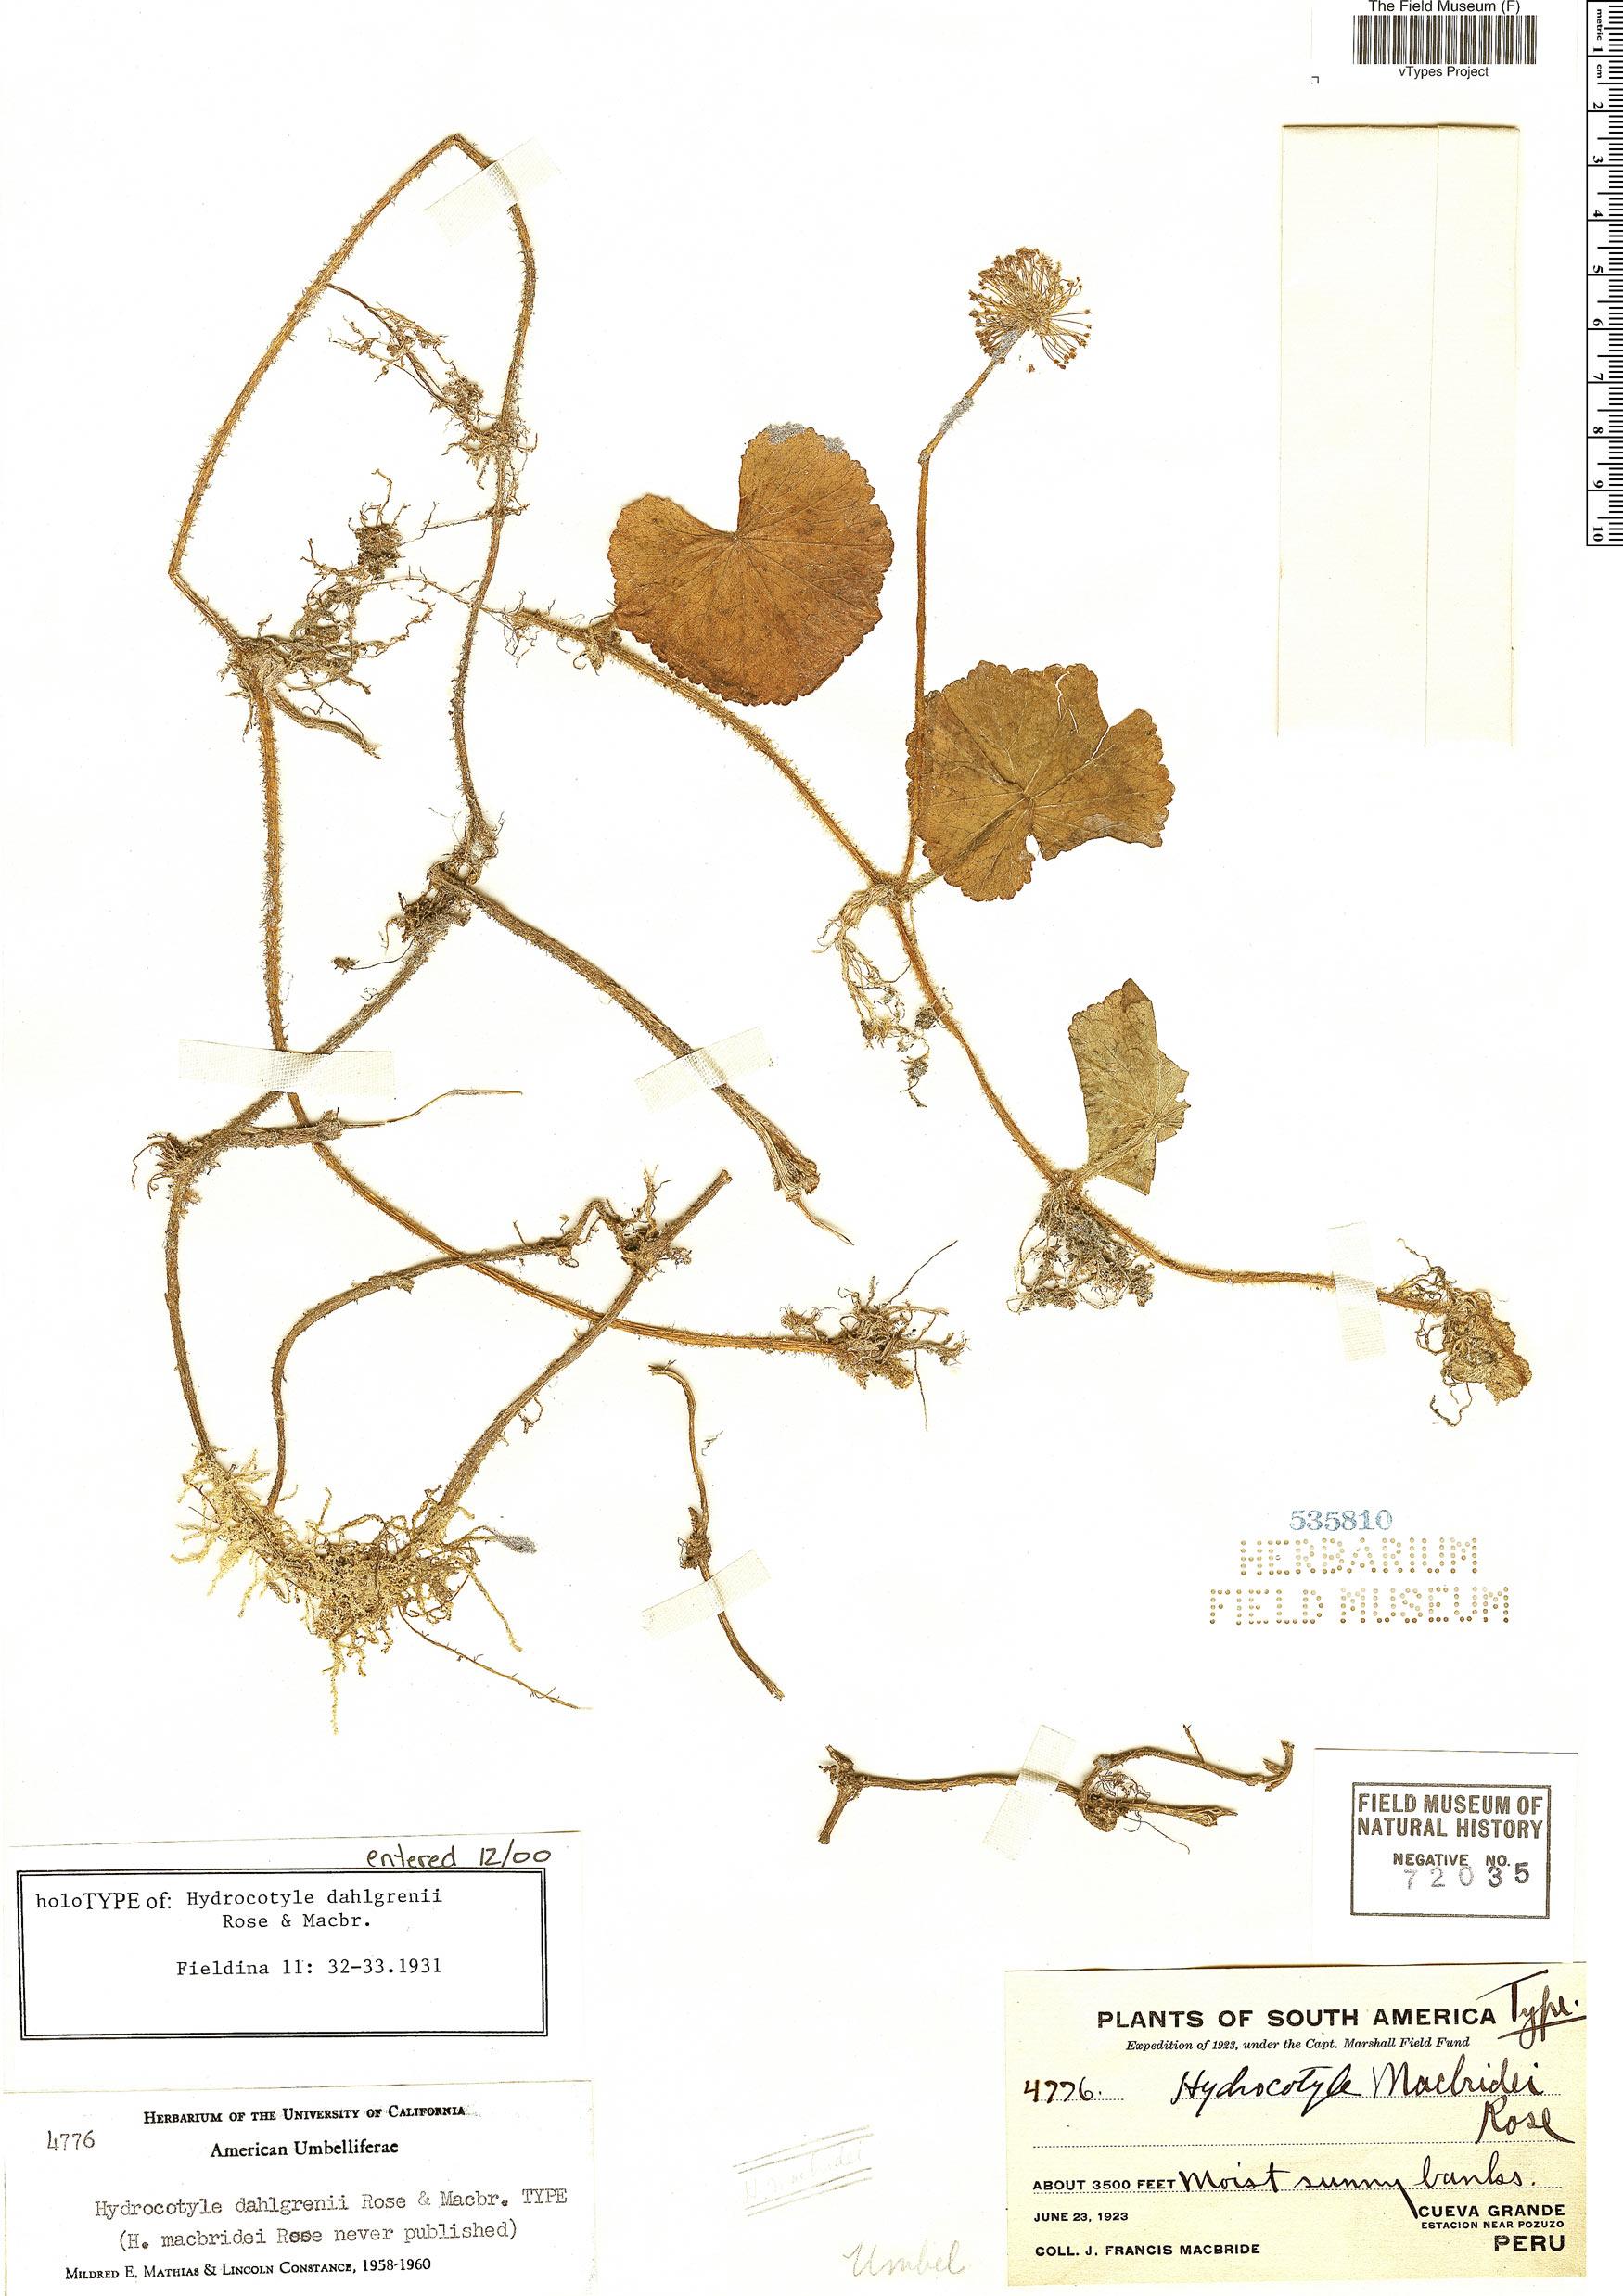 Specimen: Hydrocotyle dahlgrenii